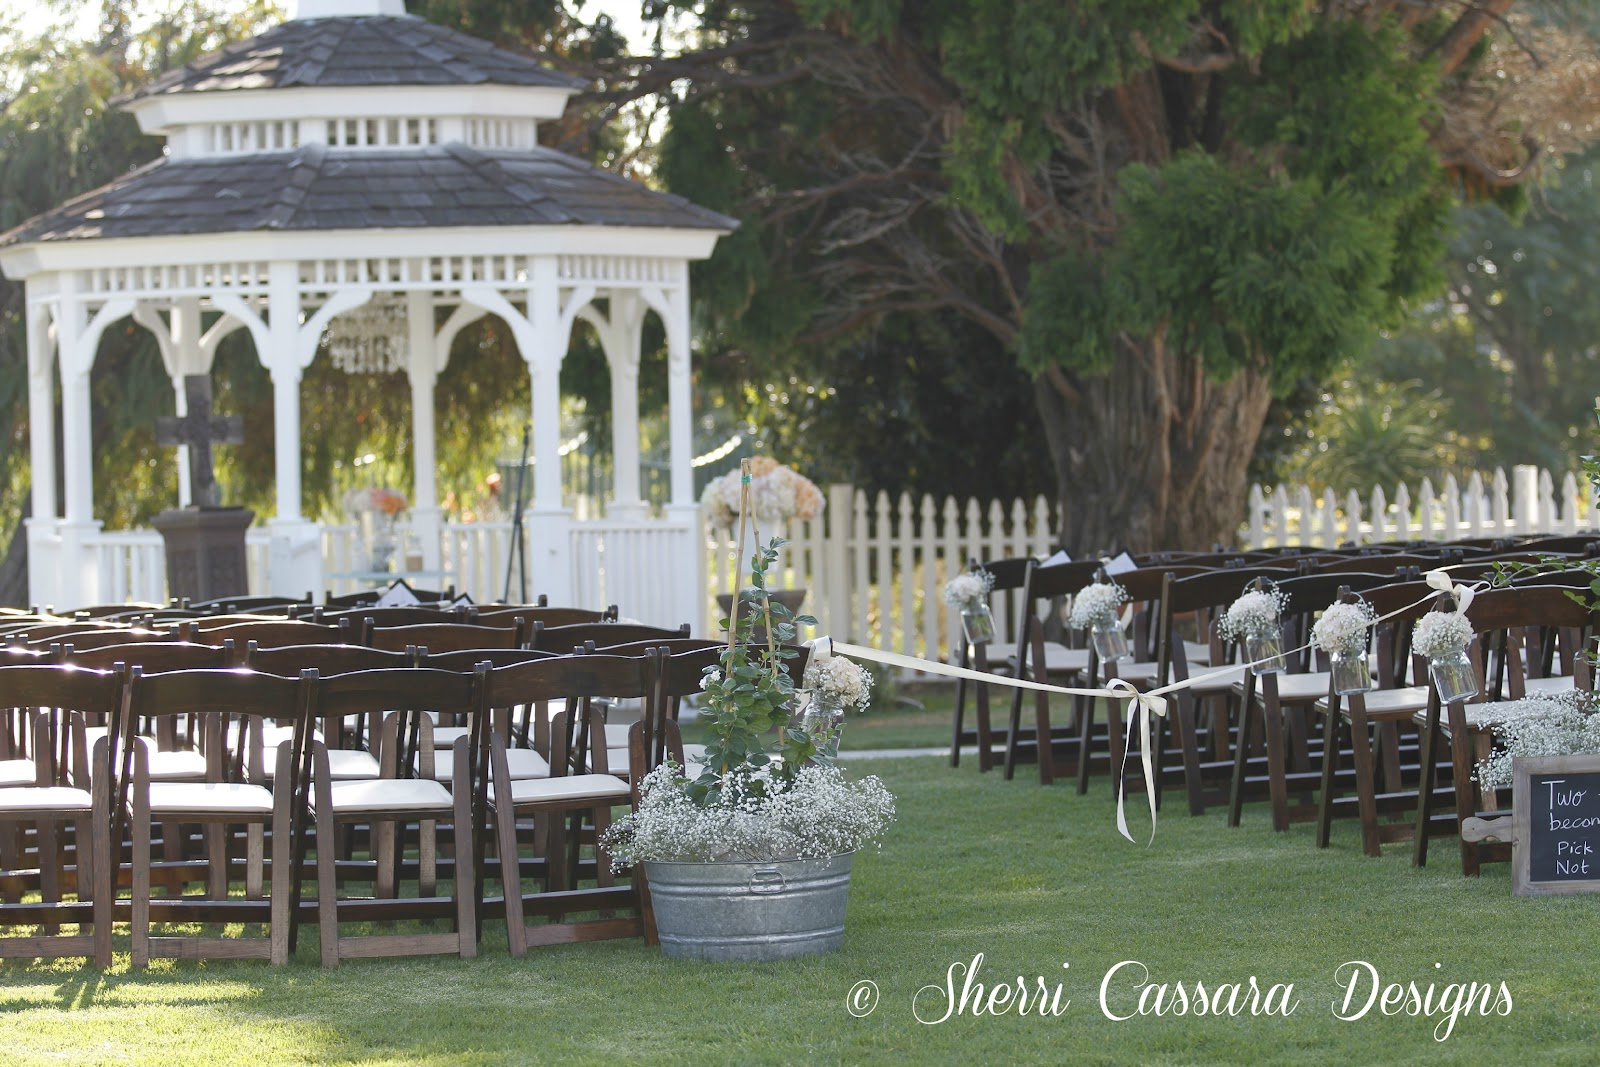 Sherri Cassara Designs A Charming Huntington Beach Barn Wedding On A Budget